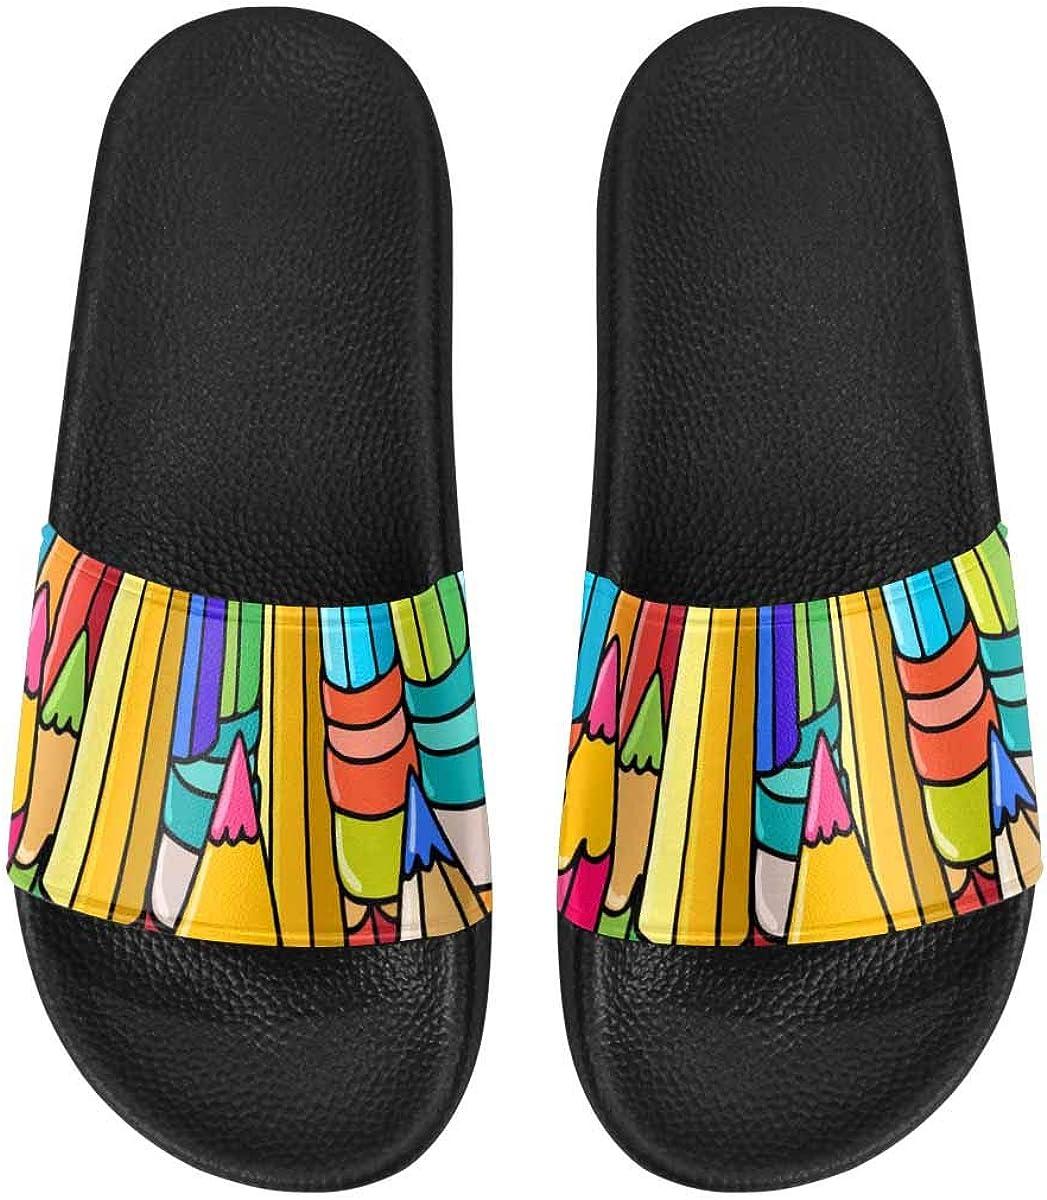 InterestPrint Slide Sandals for Women to Beach or Poor Image in Pop Art Style